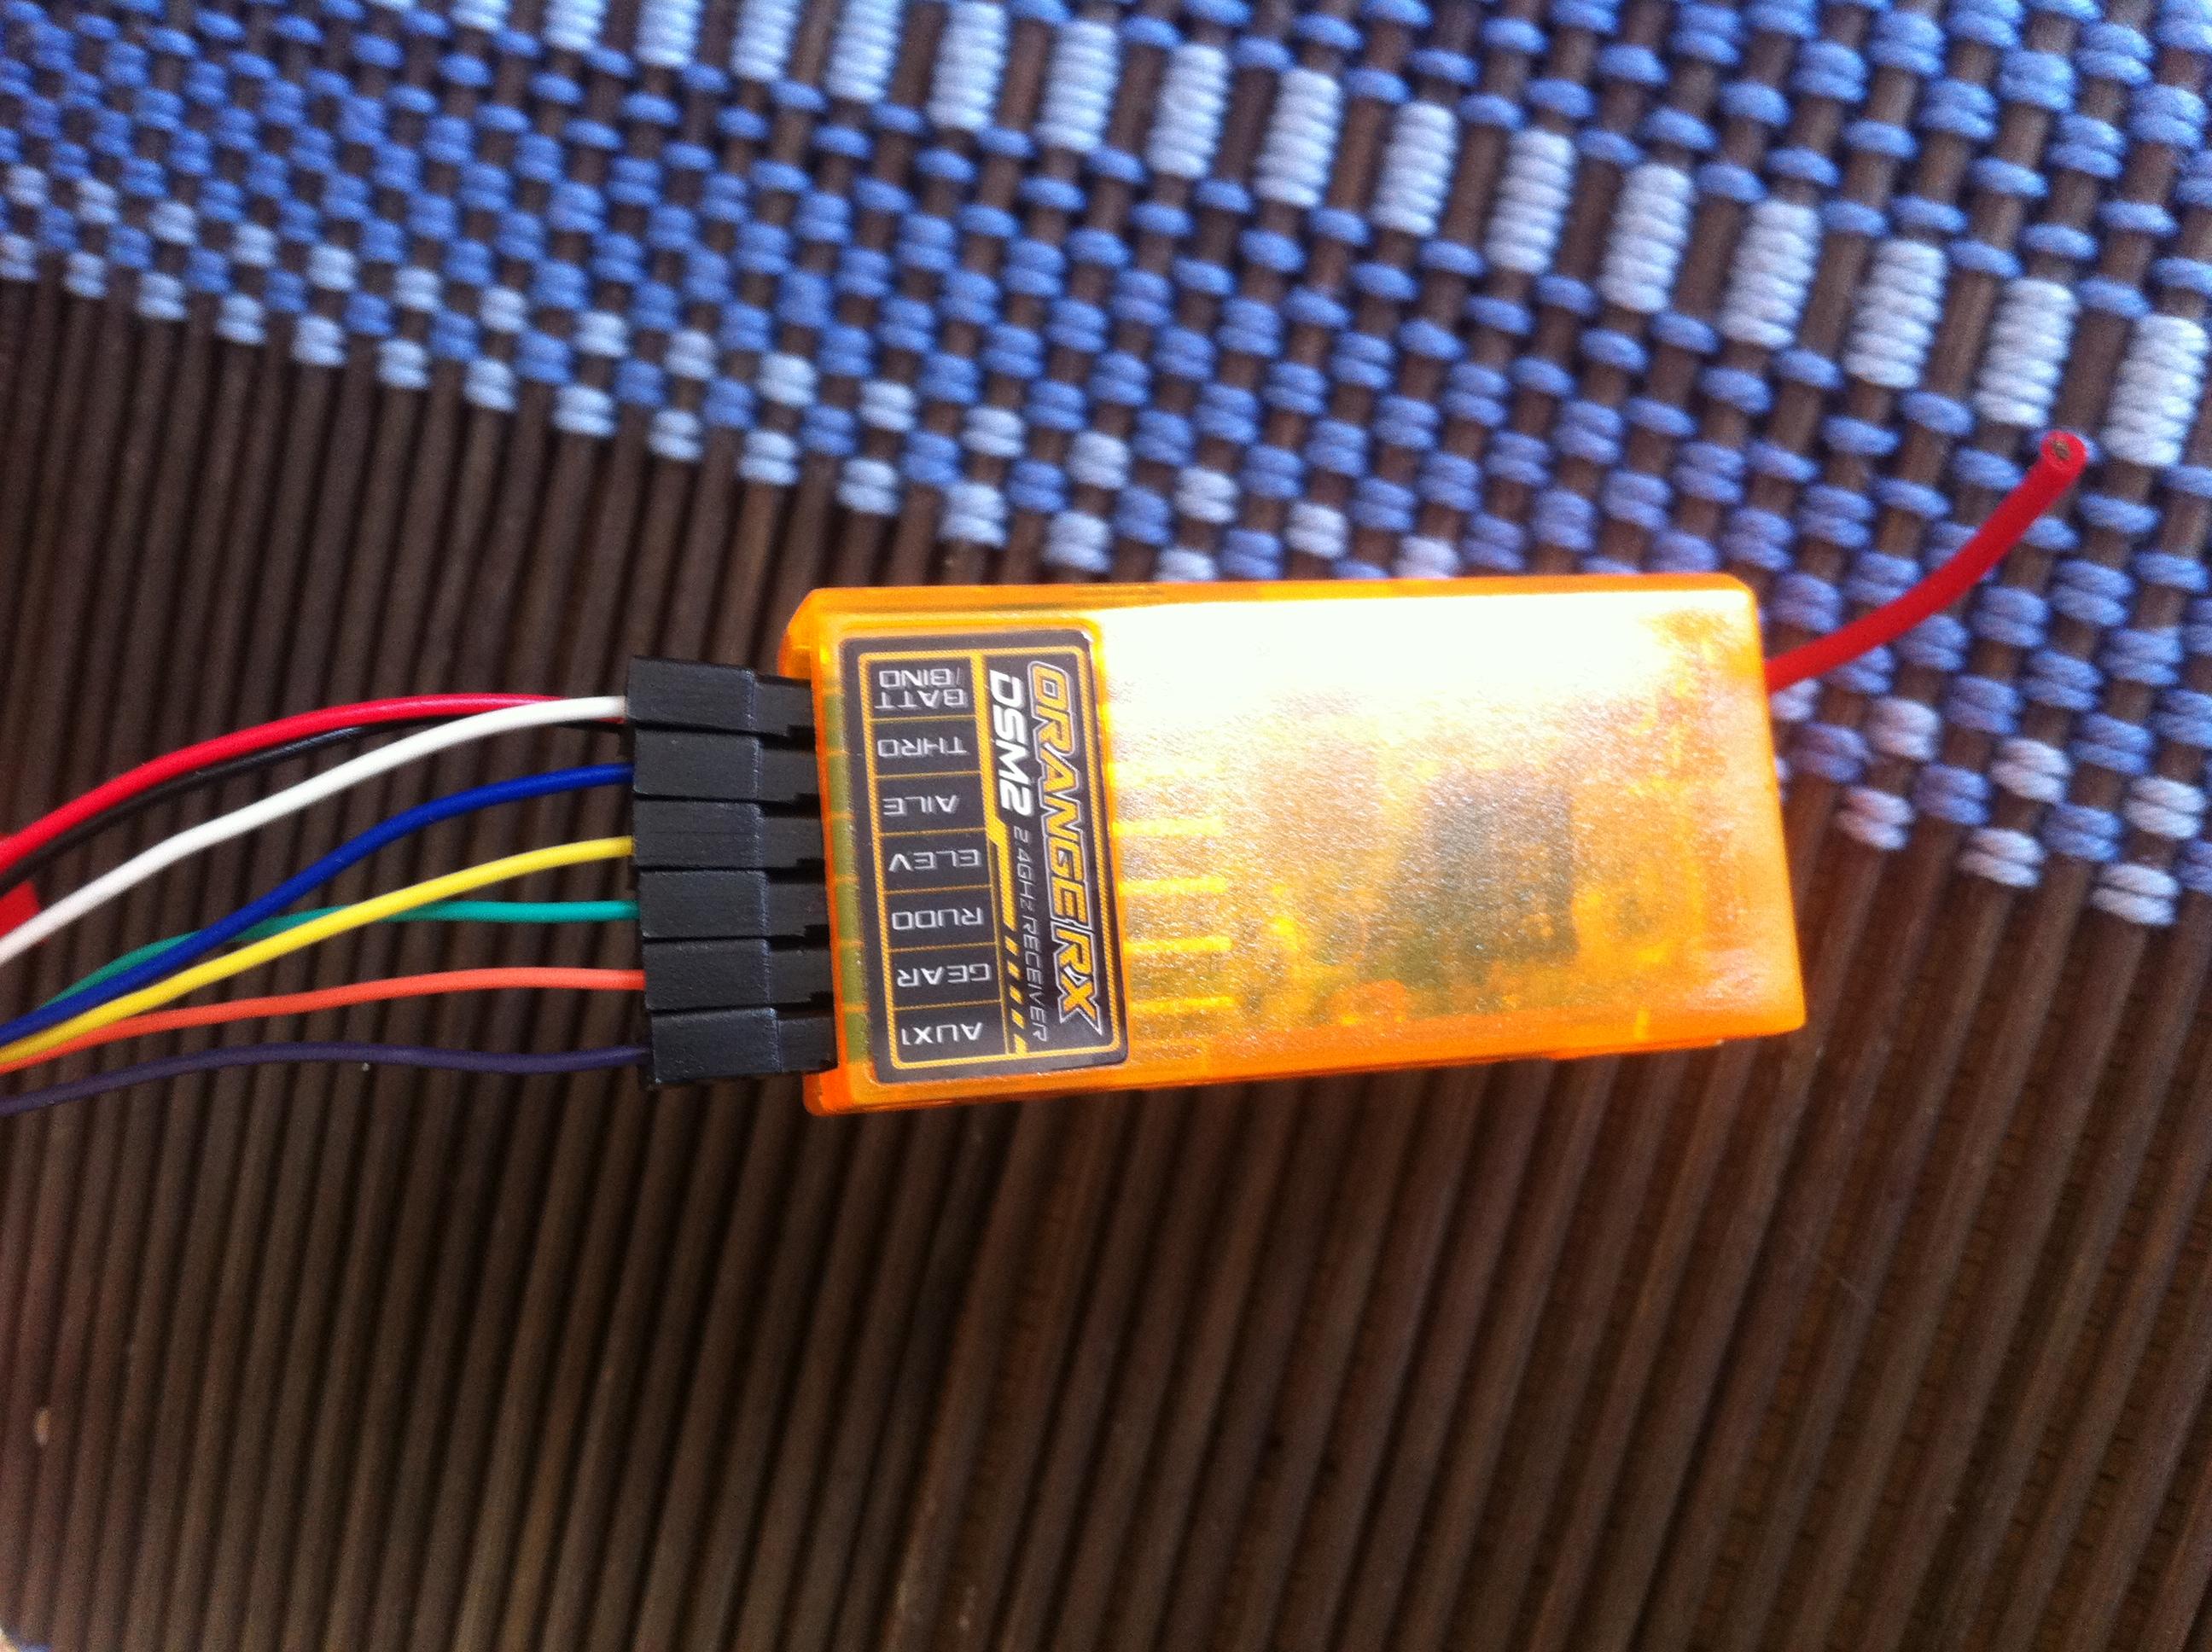 hight resolution of openpilot wiring wiring diagramopenpilot wiring wiring diagramquadcopter build logopenpilot wiring 17 st wiring diagram